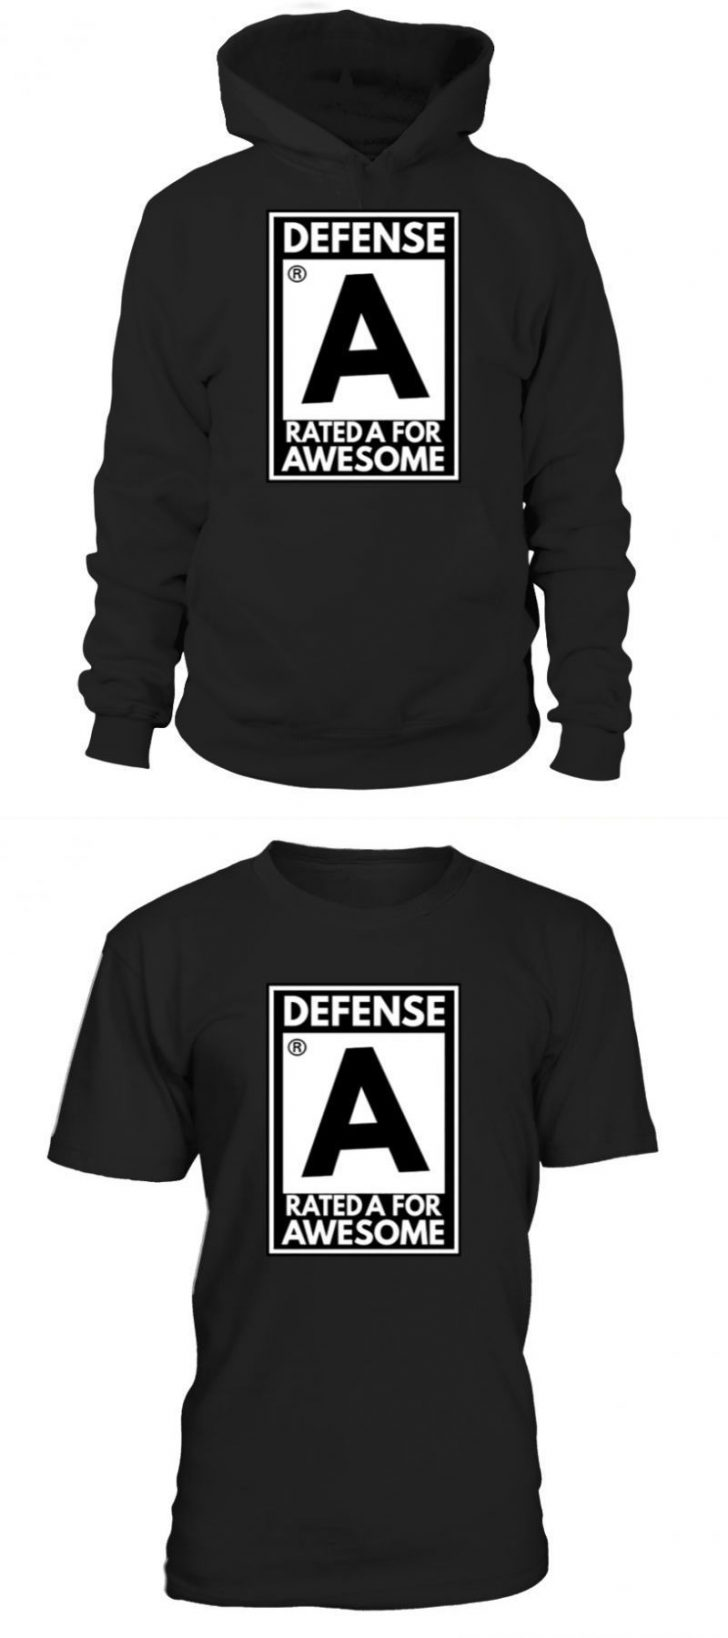 Medium Size of Fussball Sprüche T Shirt Fitness Sprüche T Shirt Alkohol Sprüche T Shirt Lustige Sprüche T Shirt Männer Küche Sprüche T Shirt